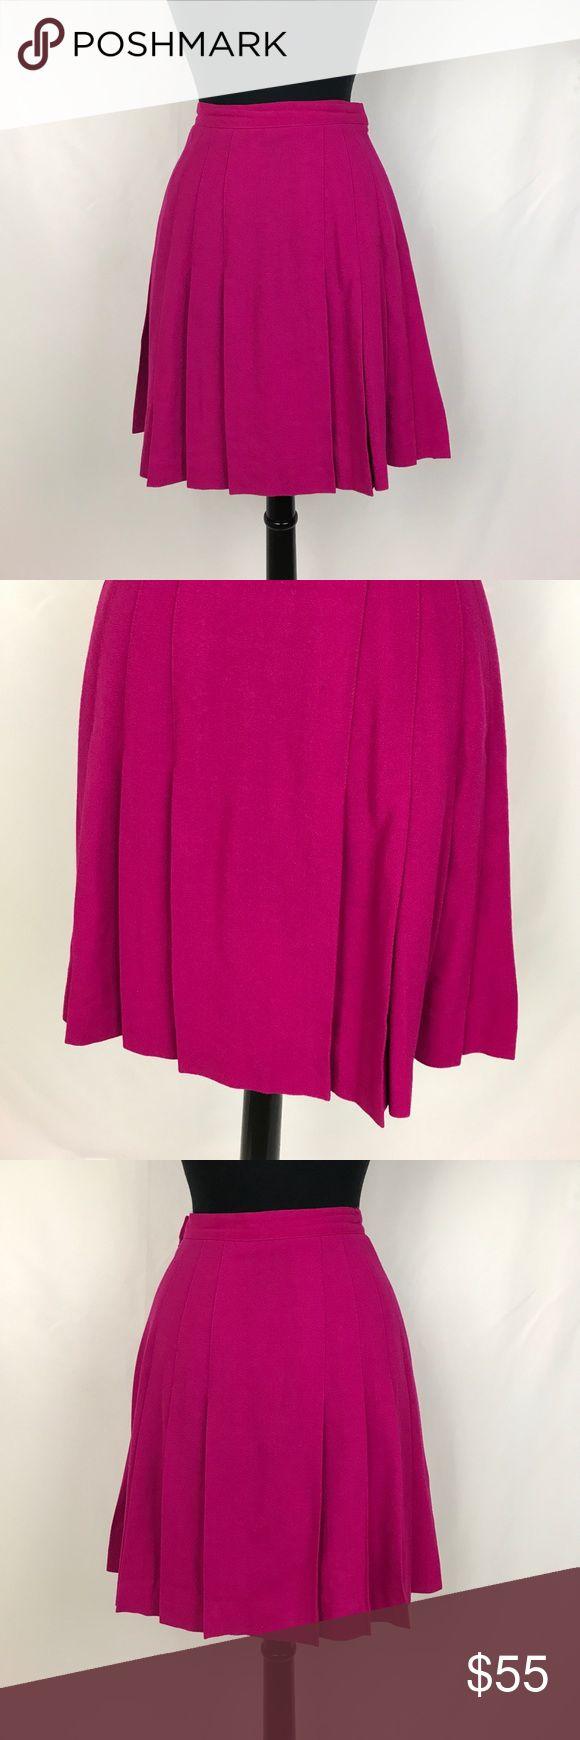 "Dana Brooke • Vintage Magenta Pleated Wool Skirt PreLoved • 13.25"" waist • 20"" length Dana Brooke Skirts"